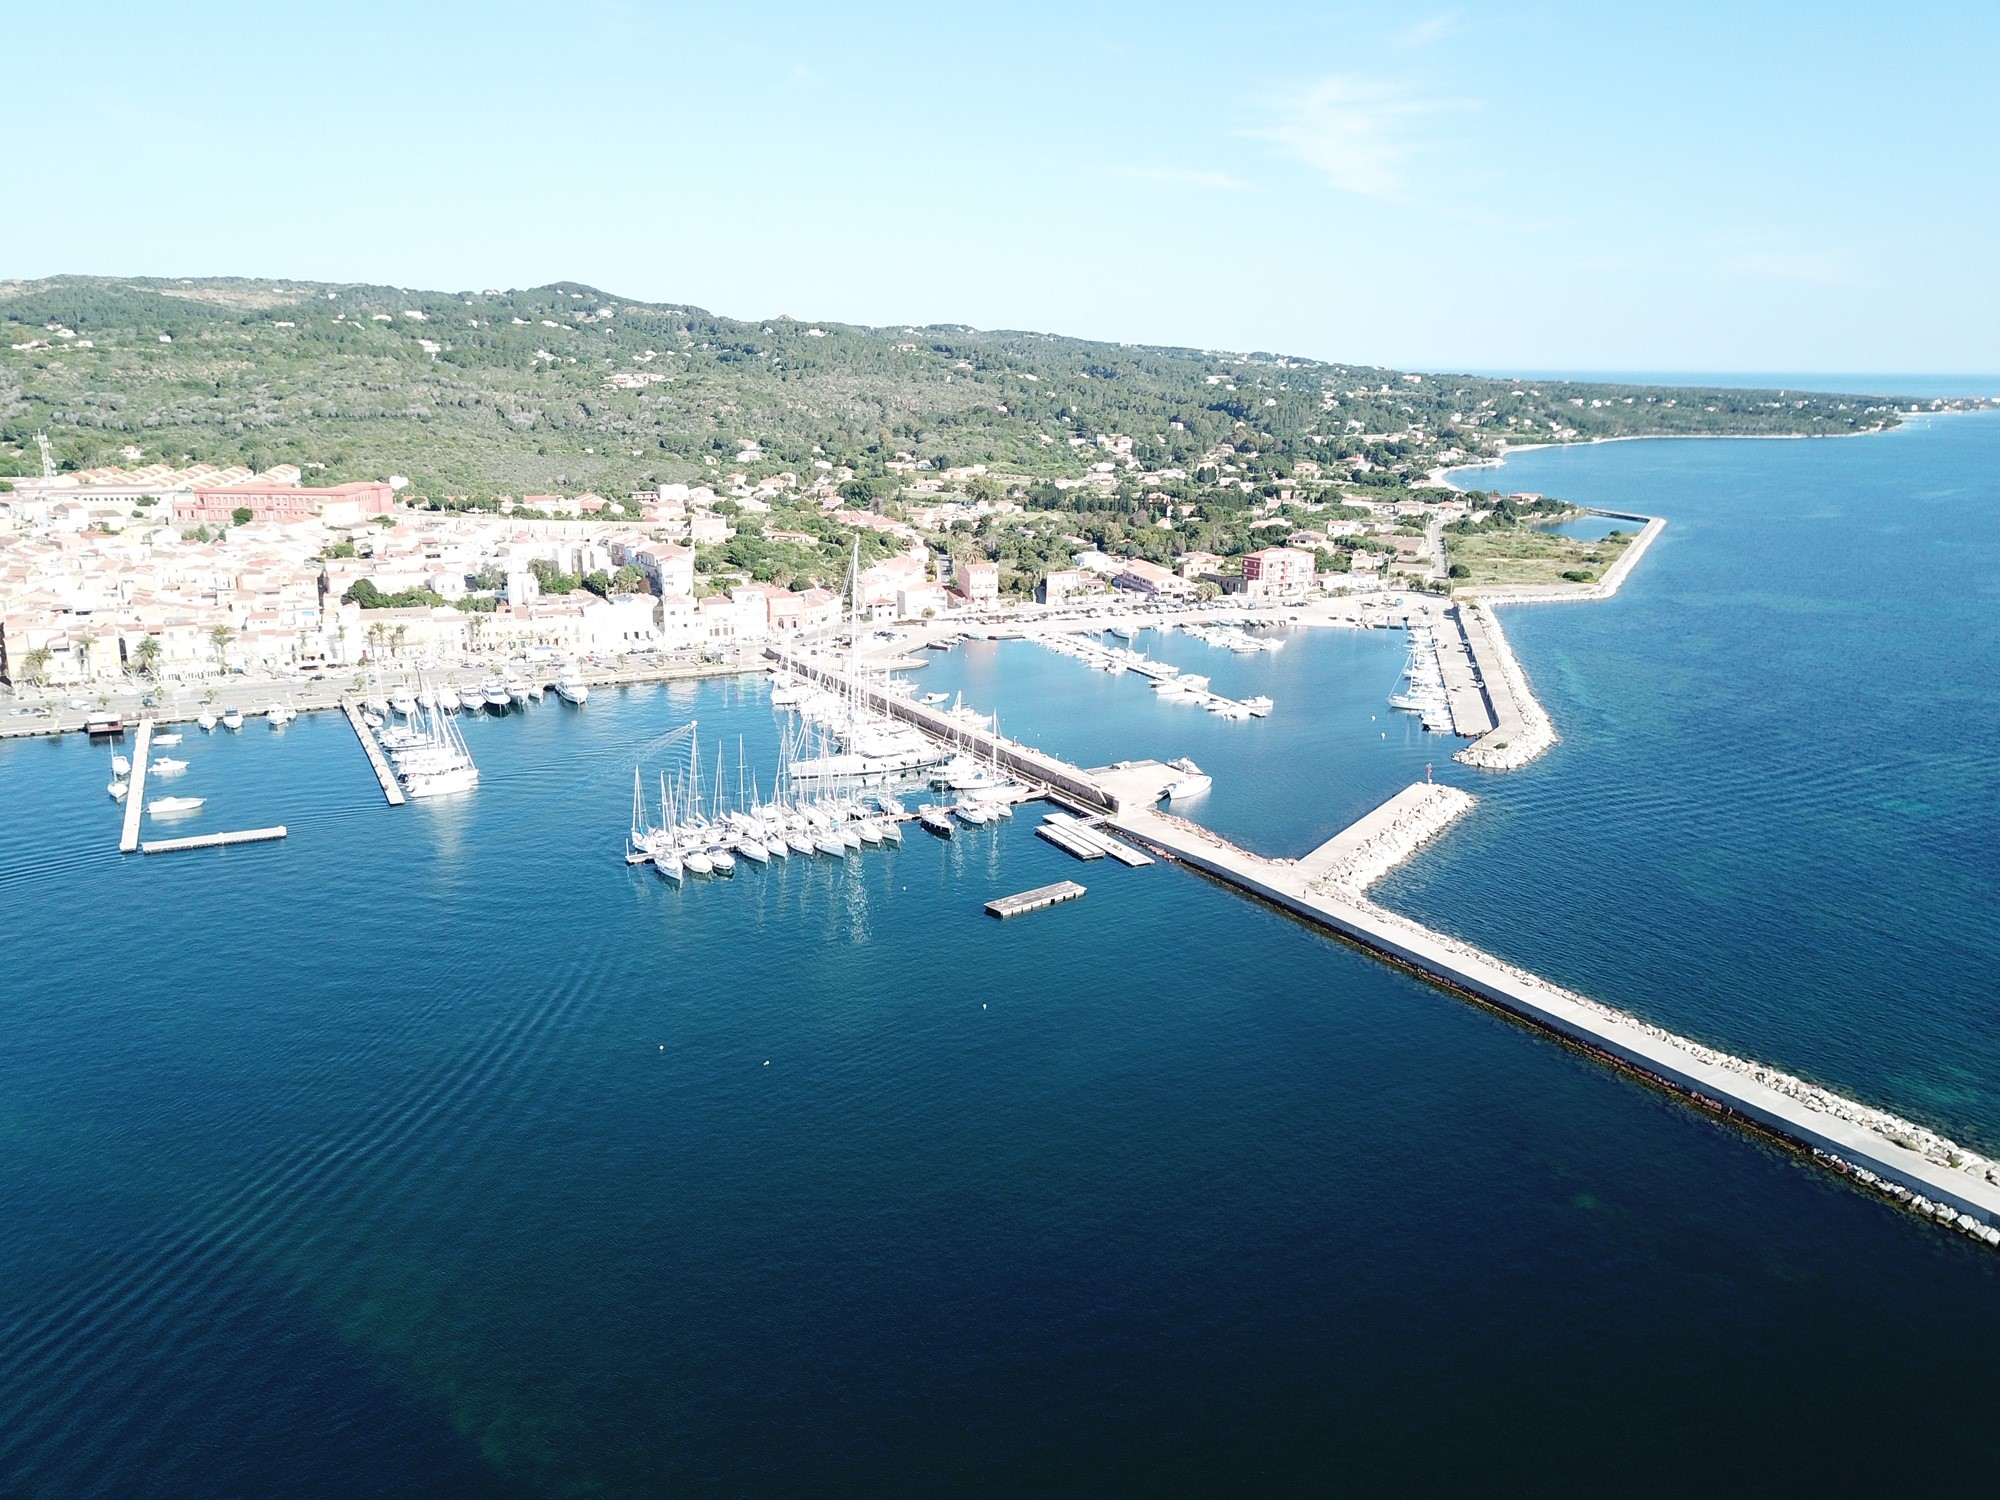 ADAC Stützpunktmarina Marine Sifredi Carloforte, Isola San Pietro, Sardinien.